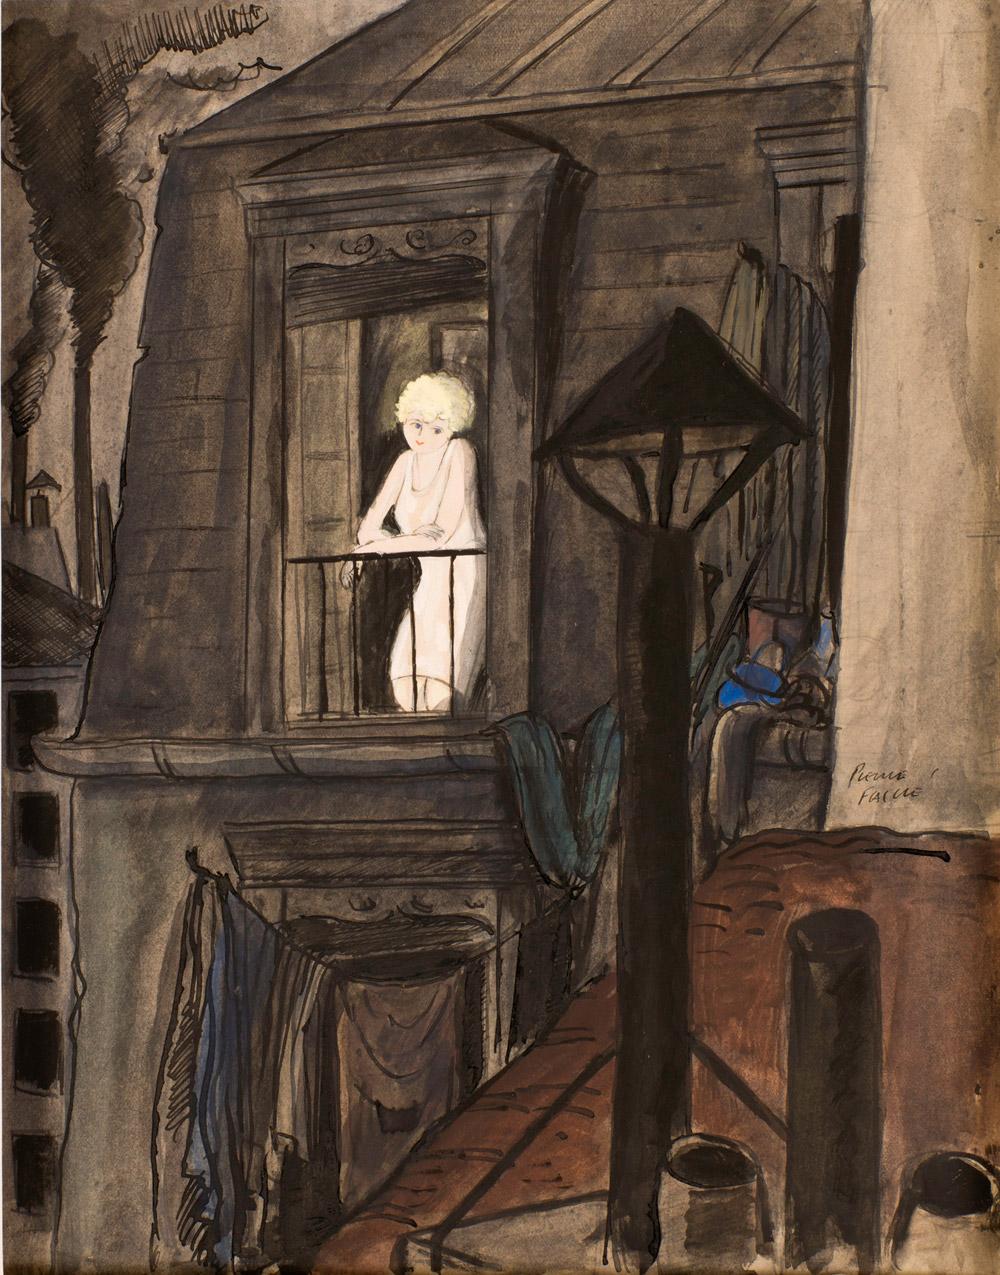 Jeune fille à la fenêtre | Pierre Falké | Jeune fille à la fenêtre